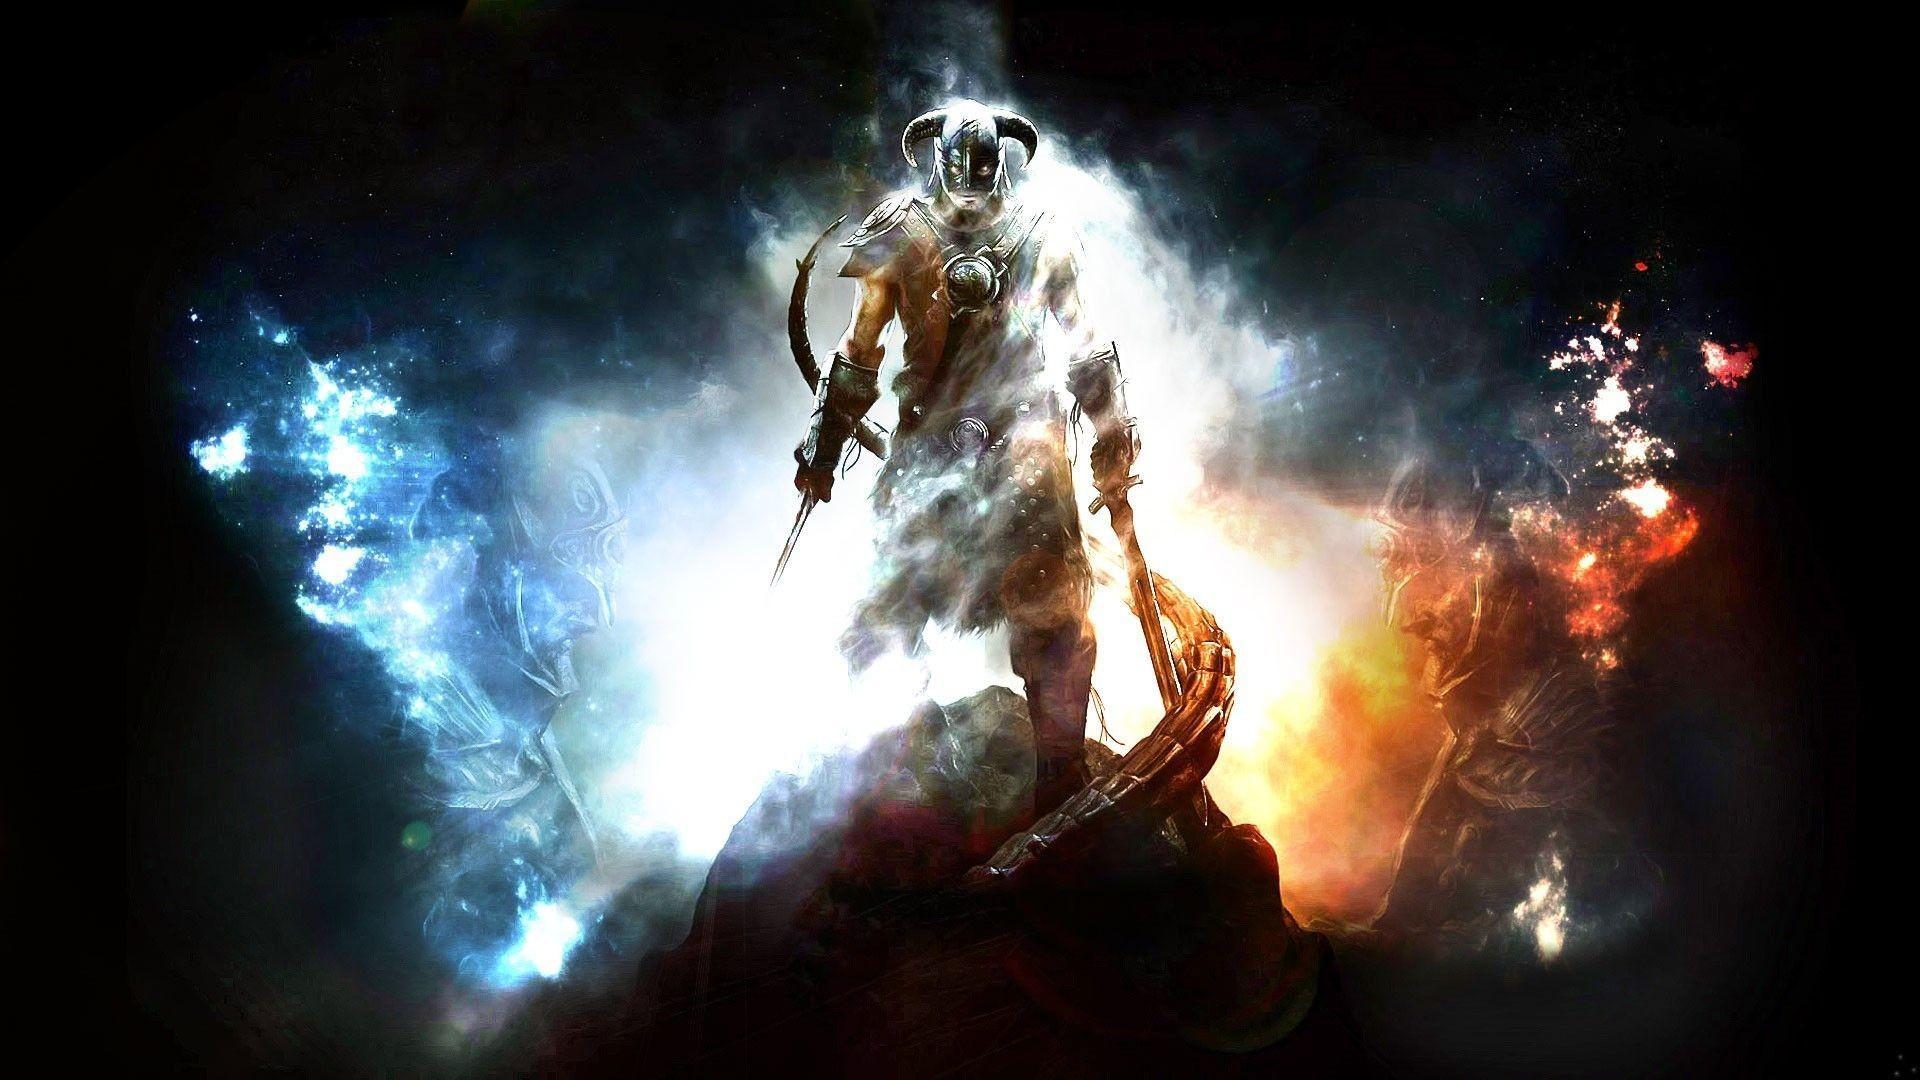 1188 The Elder Scrolls V: Skyrim HD Wallpapers